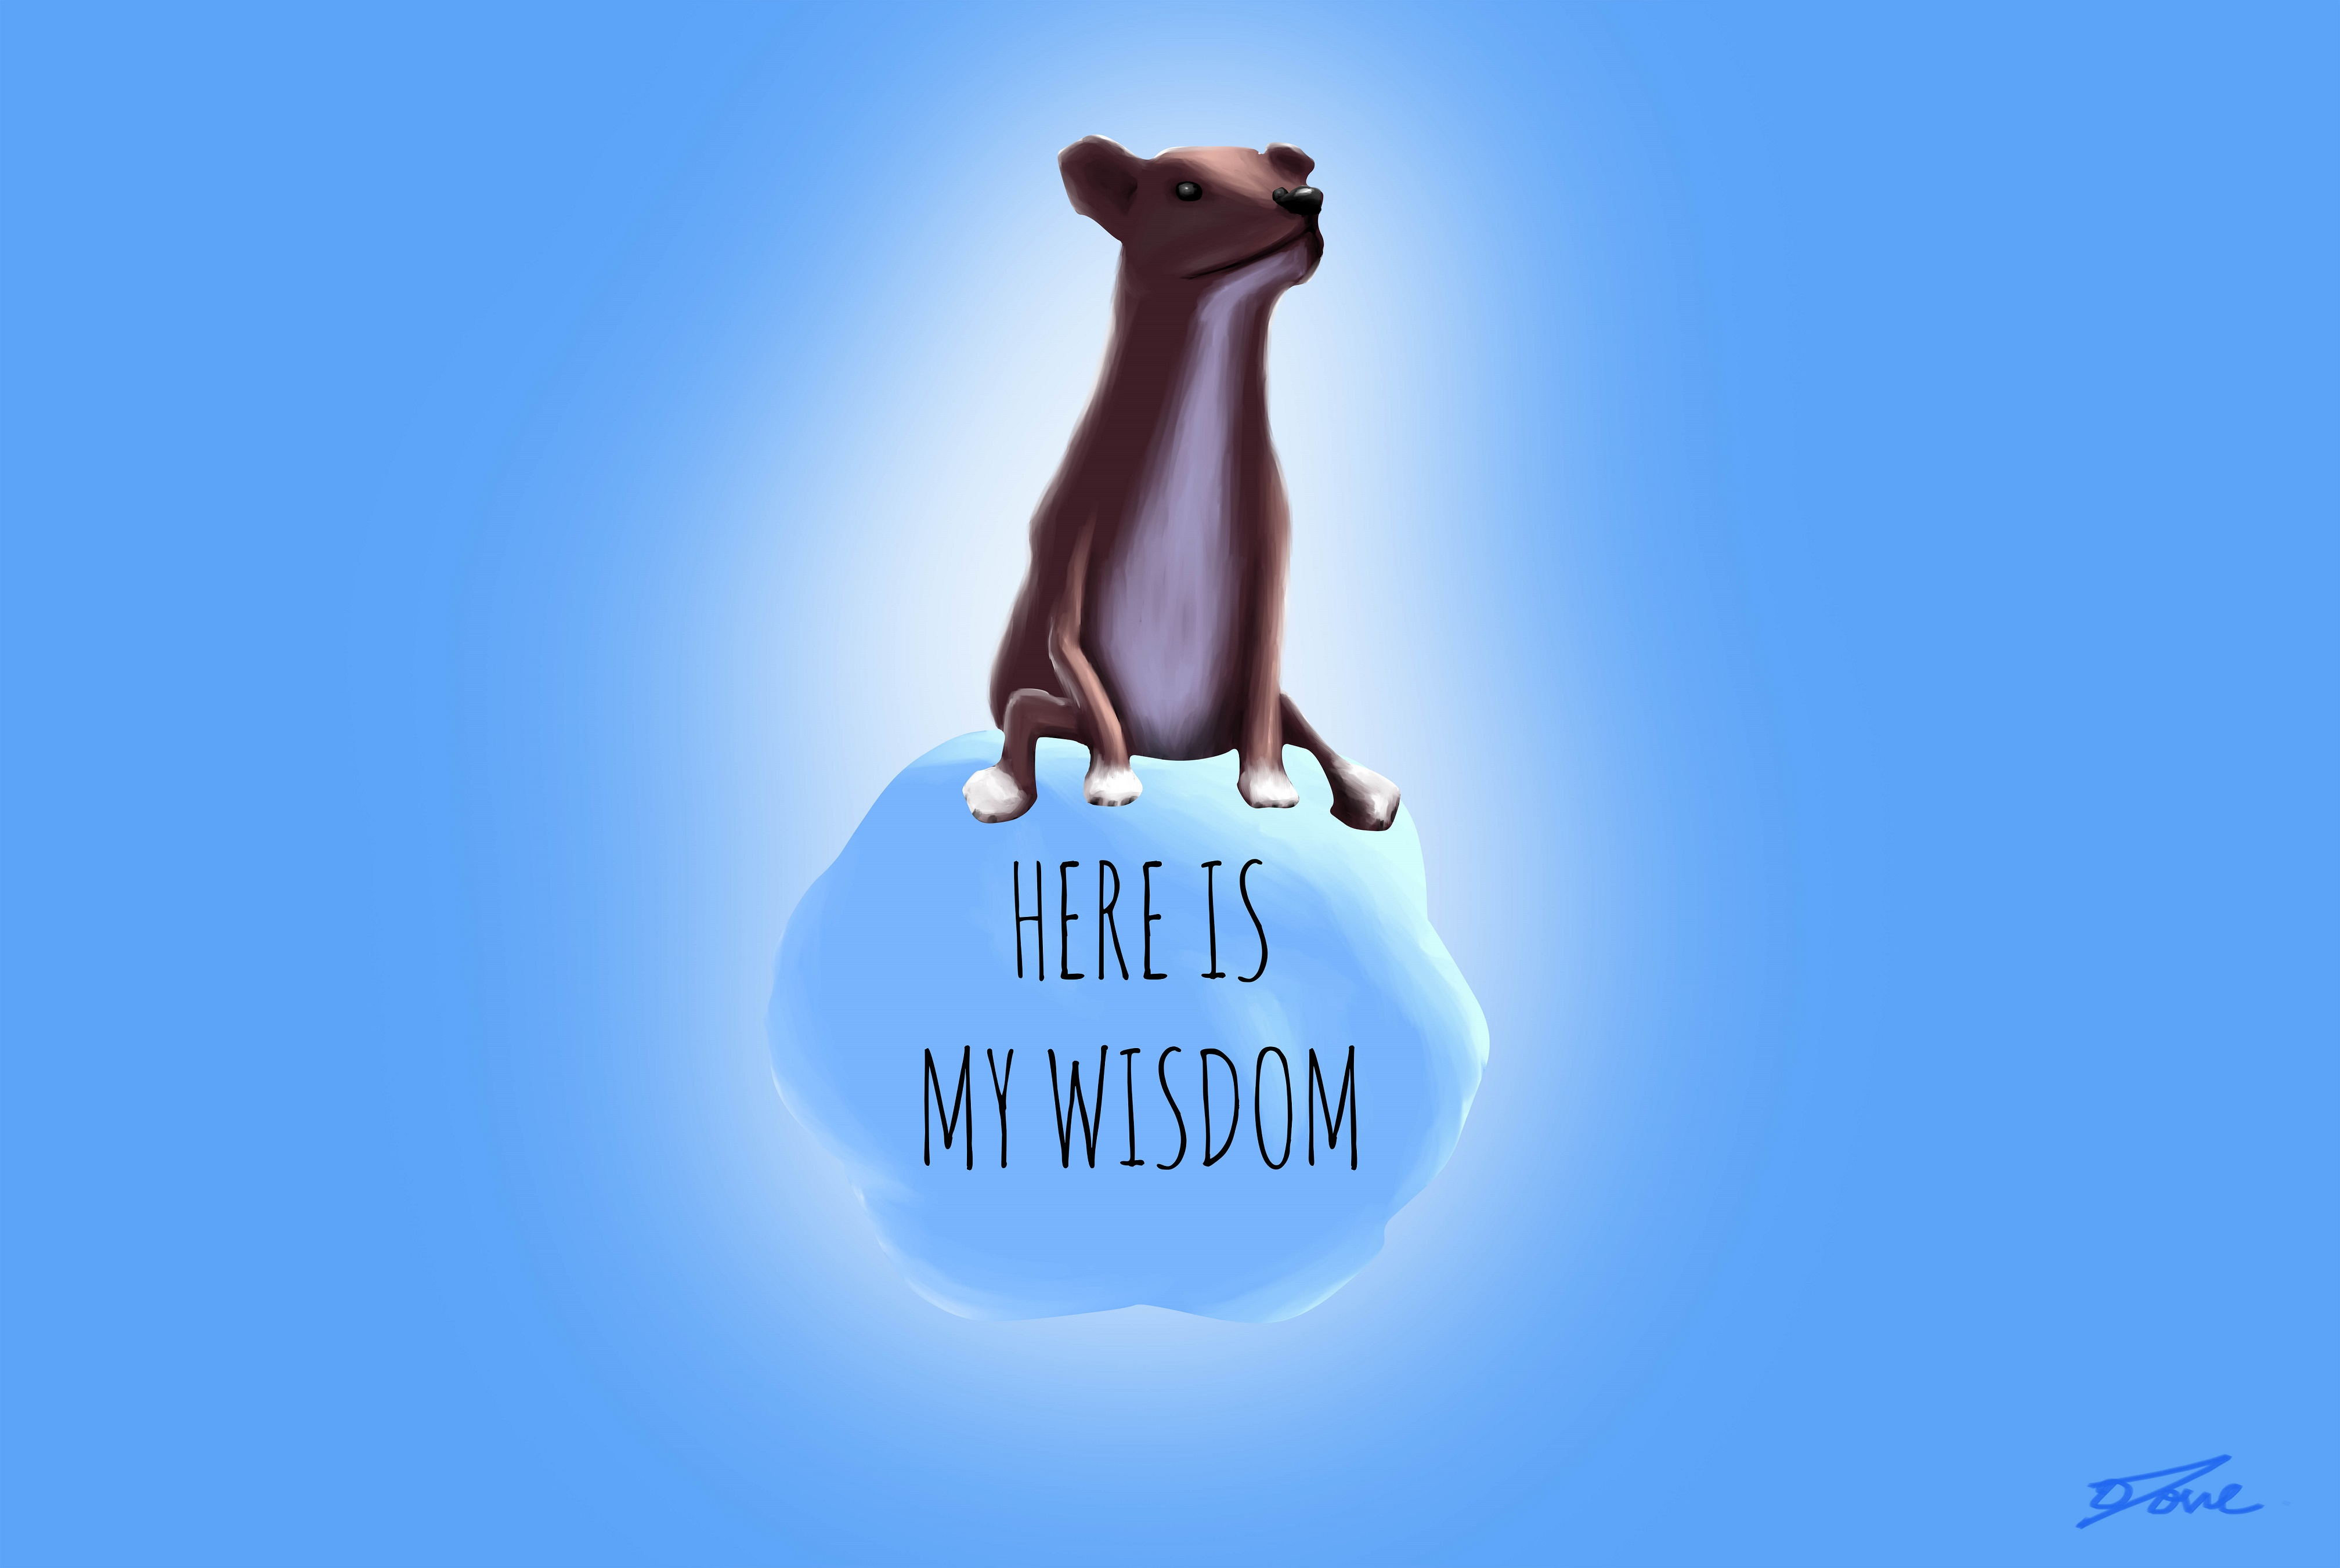 The Dog of Wisdom